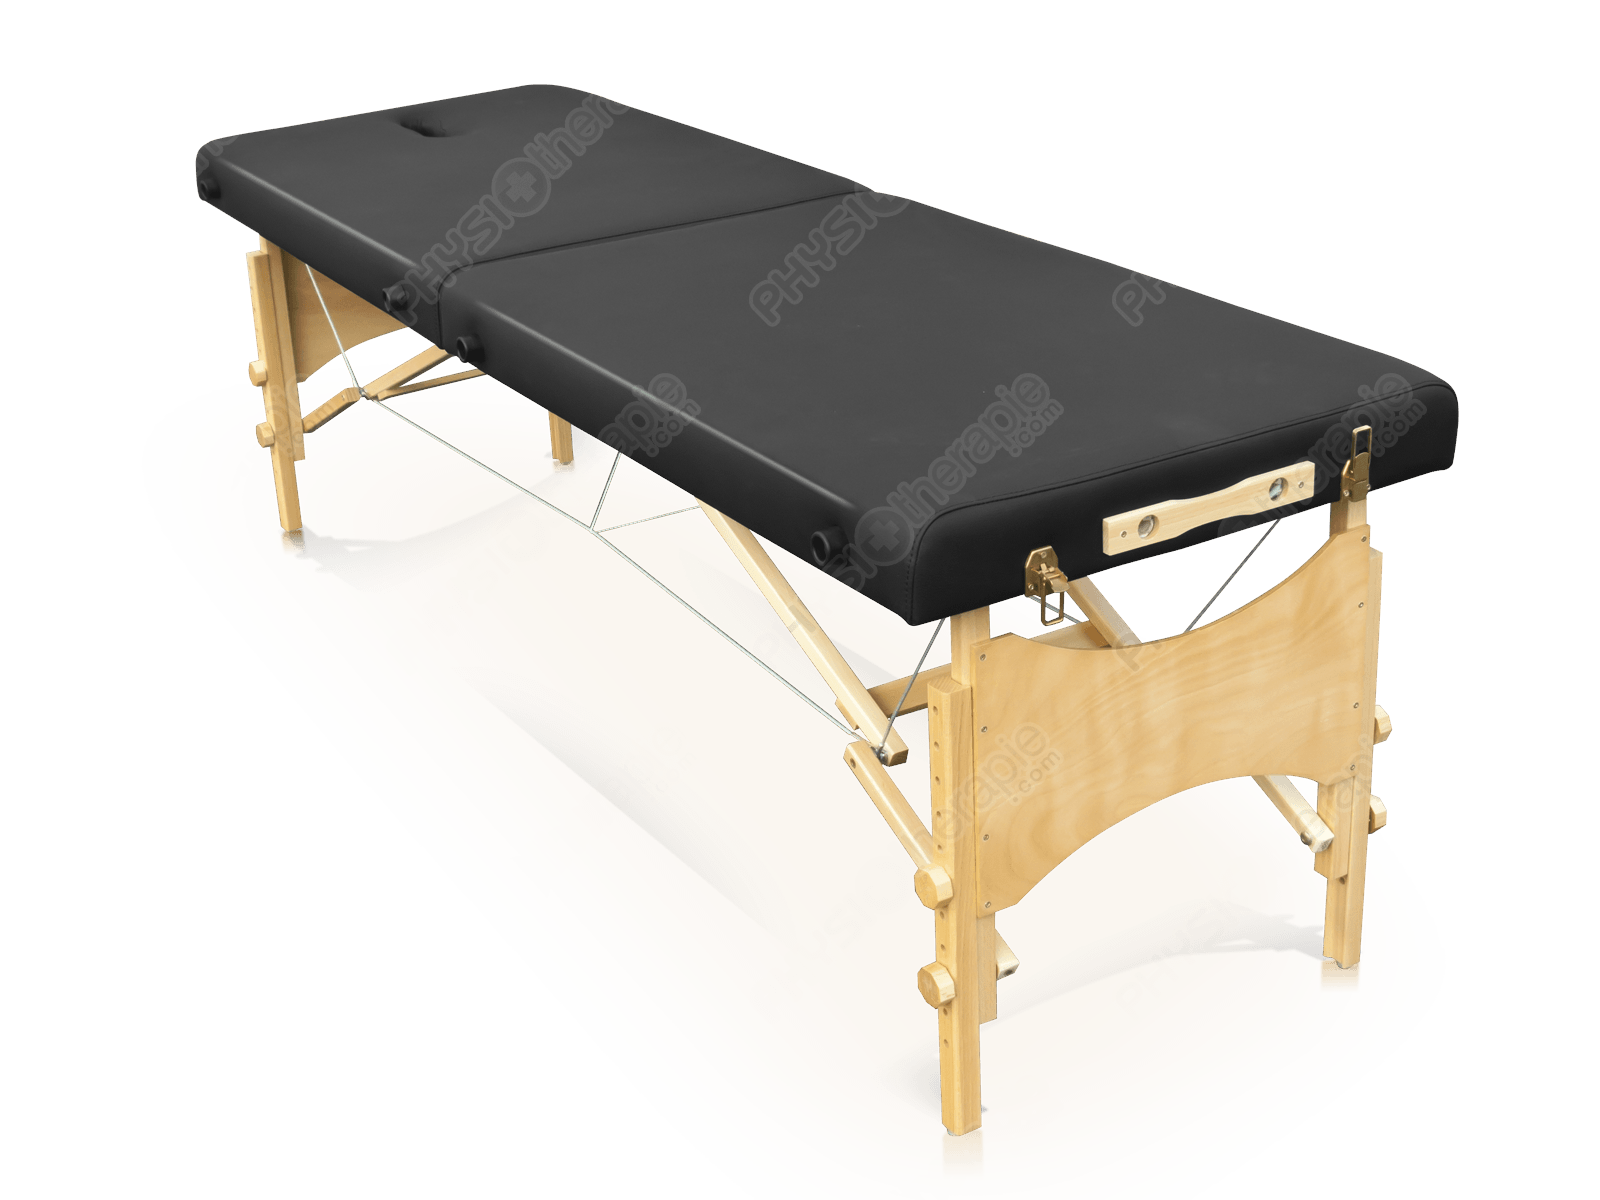 table de massage pliante physiopro. Black Bedroom Furniture Sets. Home Design Ideas